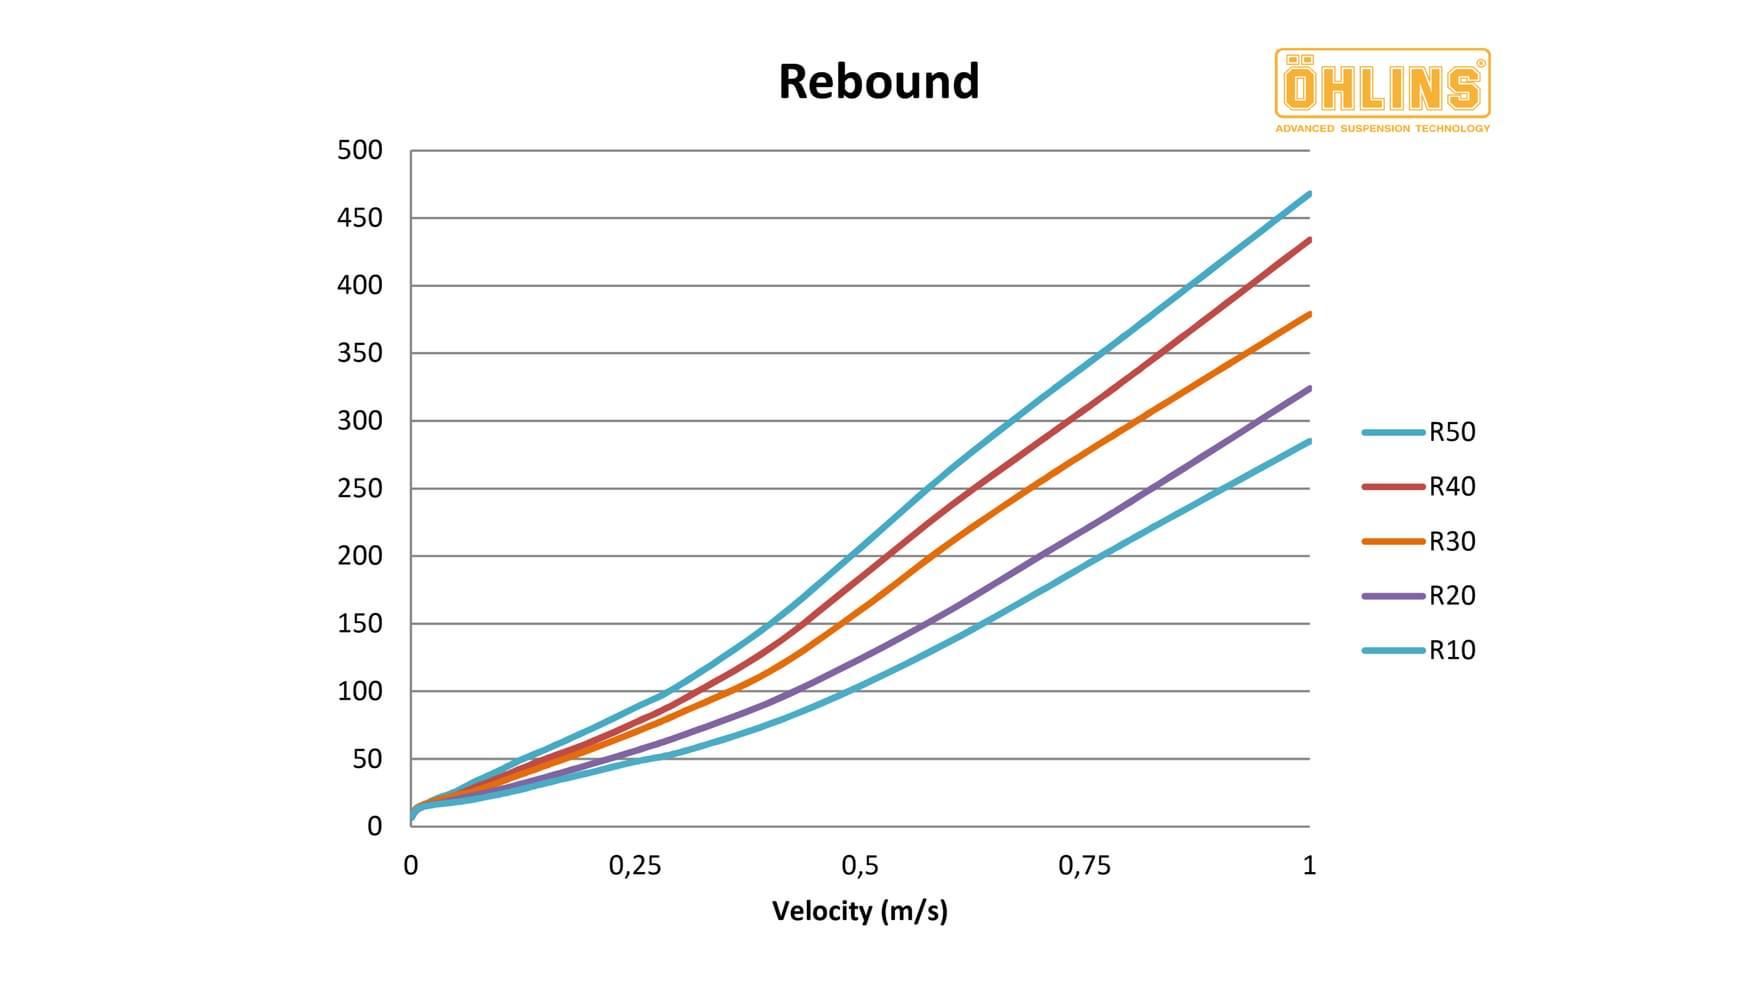 Ohlins Custom Tuning Rebound Chart